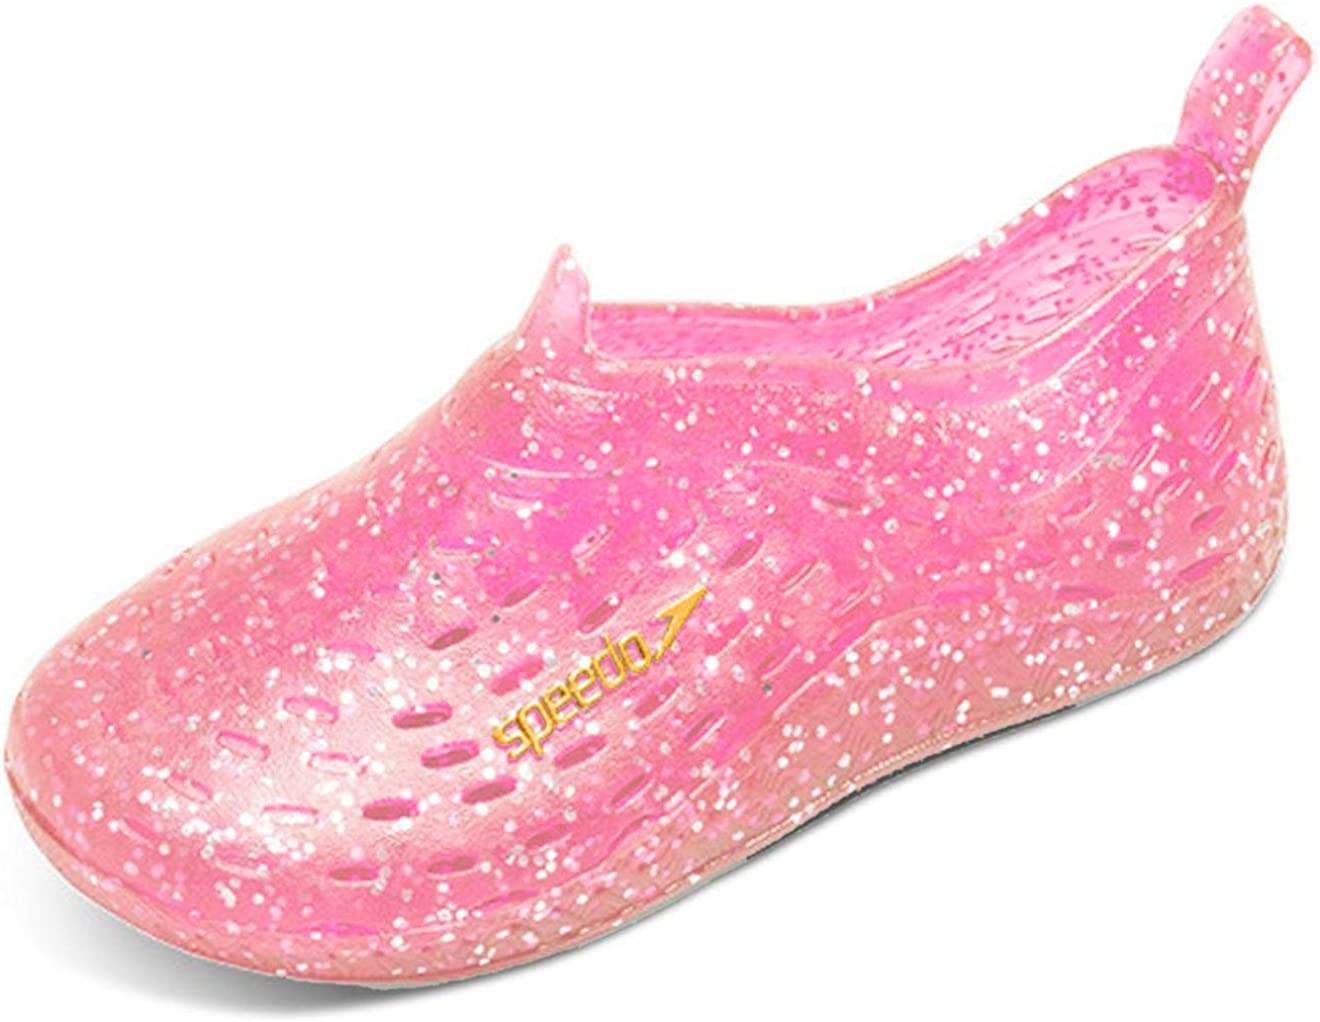 Speedo Kids Water Shoe Exsqueeze Me Jelly Toddler